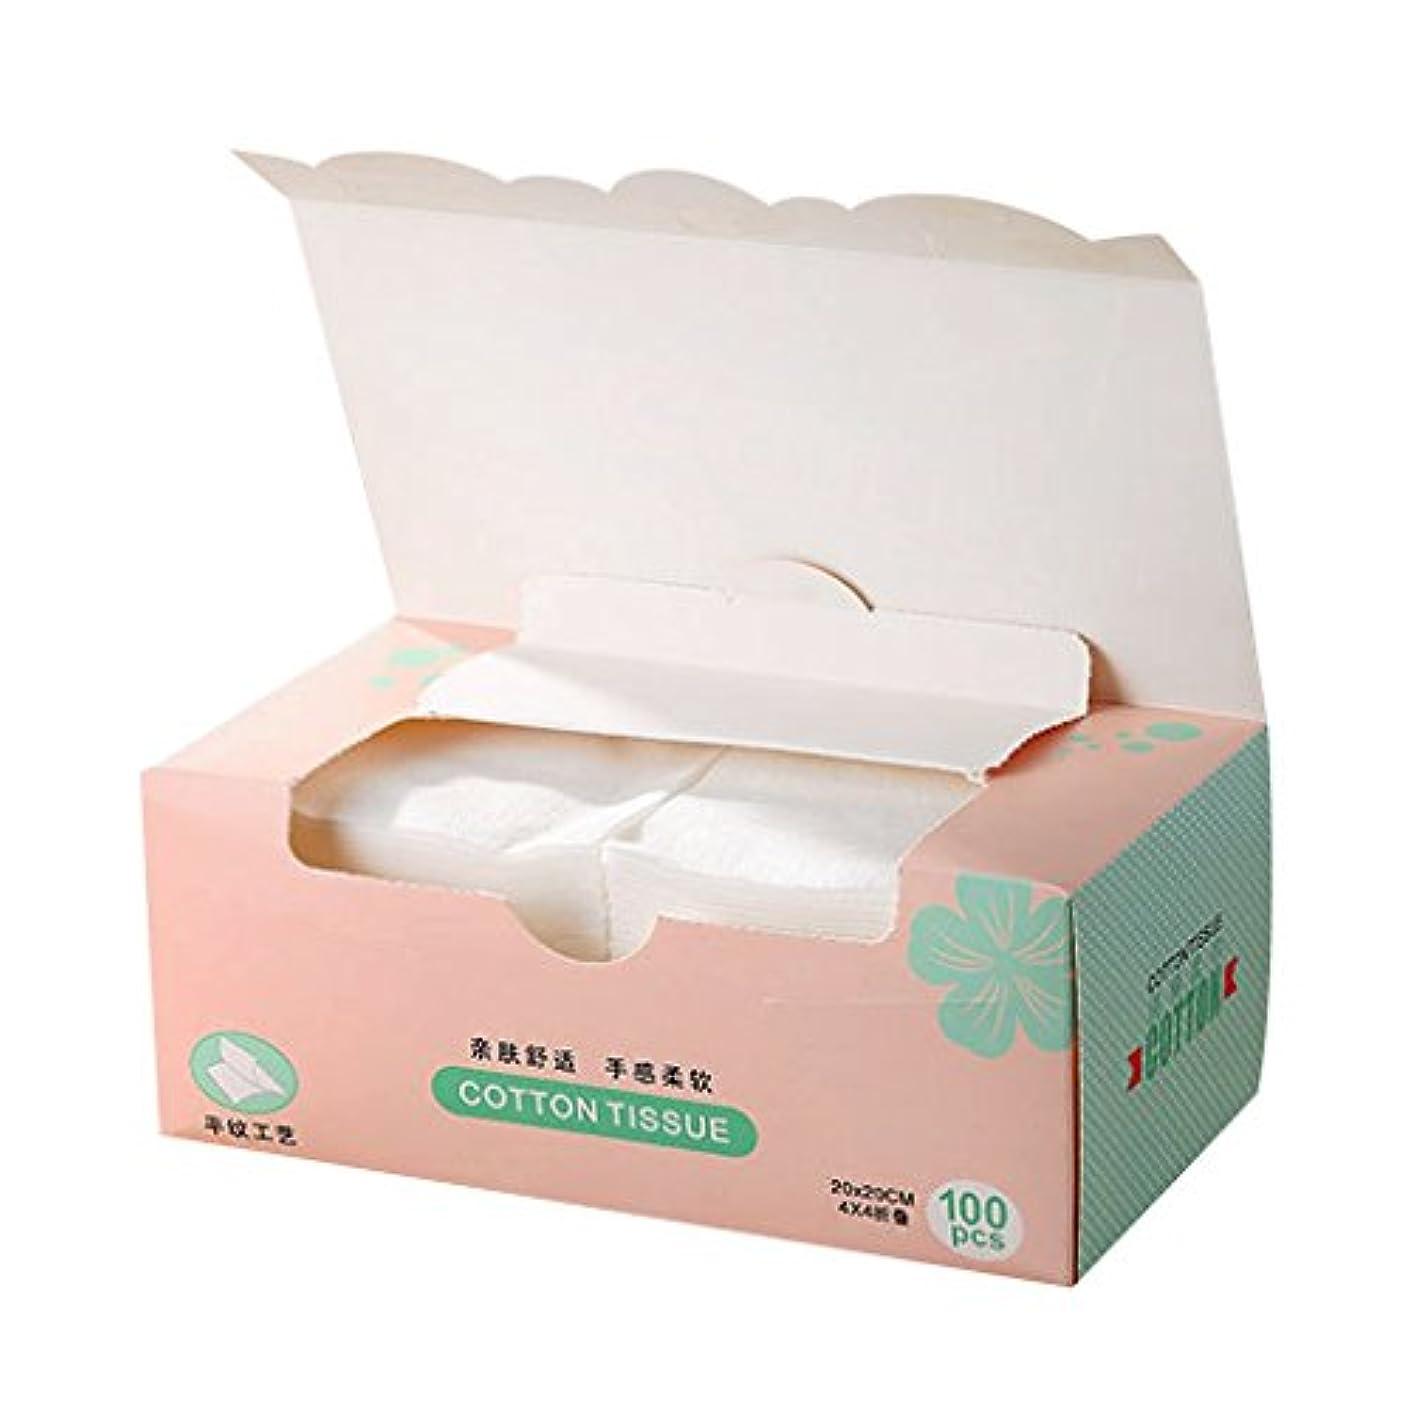 Homyl 顔用タオル 使い捨て メイクリムーバー タオル 旅行用 来客用 便利